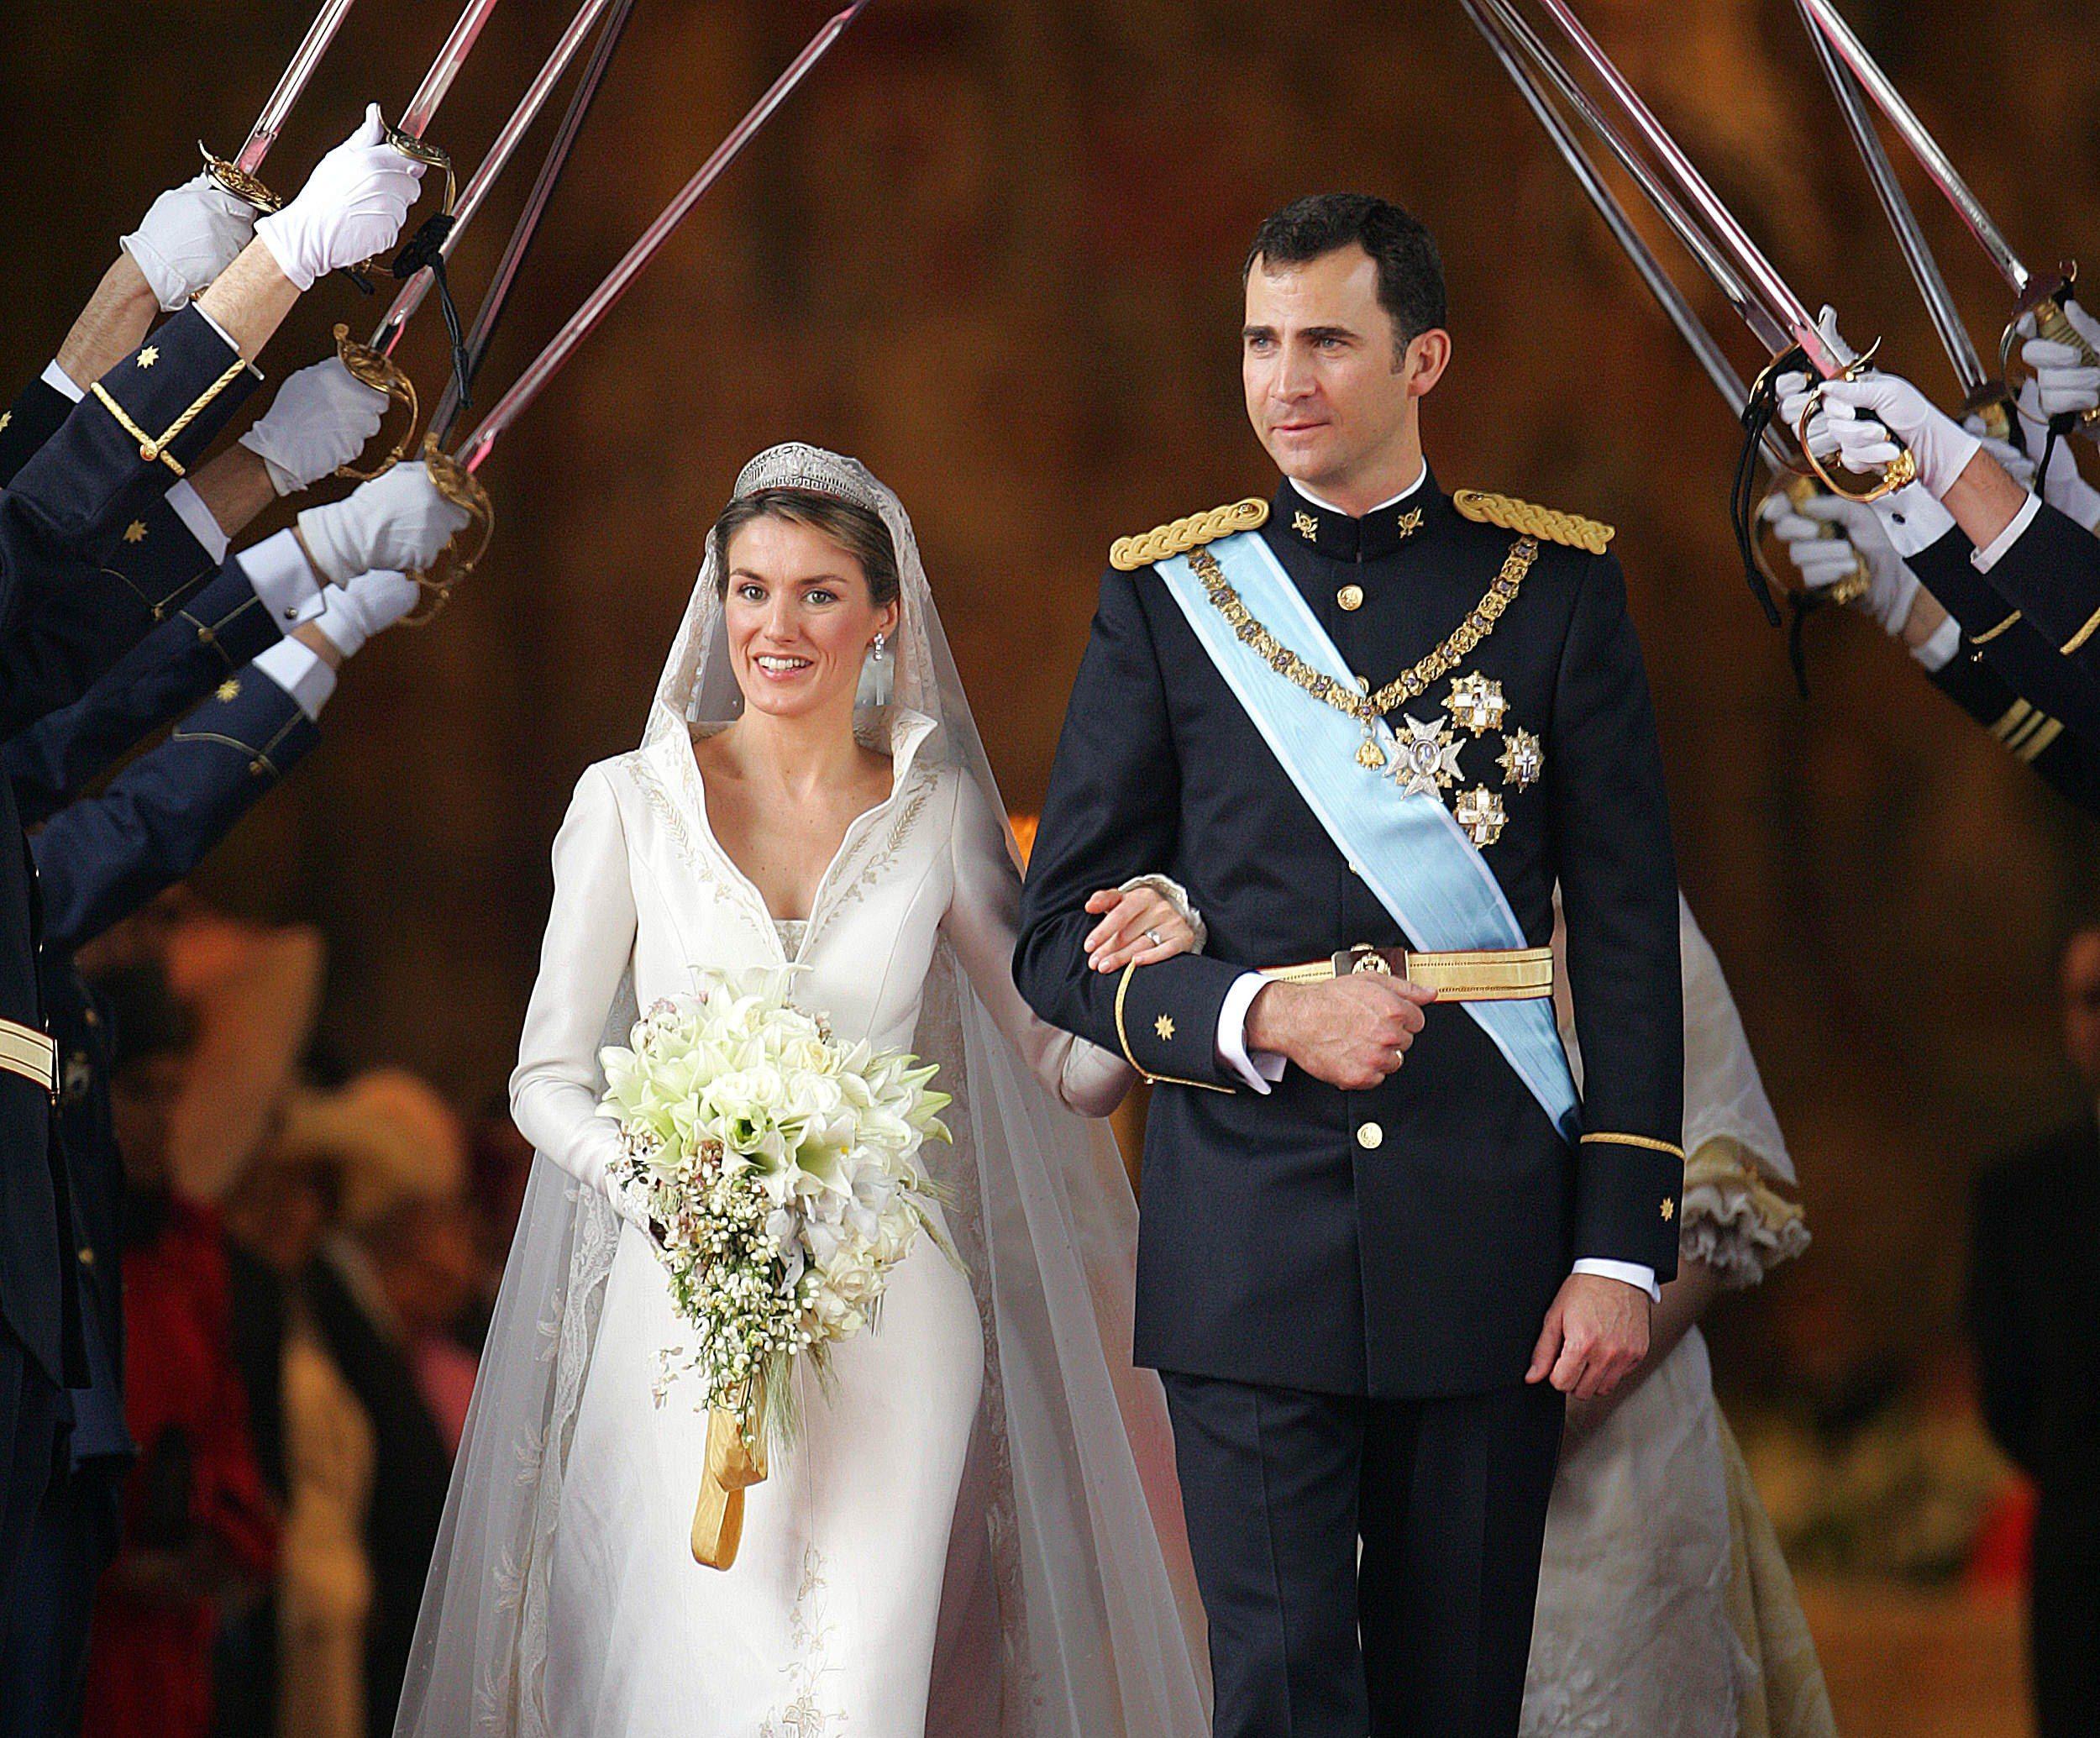 Princess of Asturias Letizia Ortiz and Spanish Crown Felipe of Bourbon